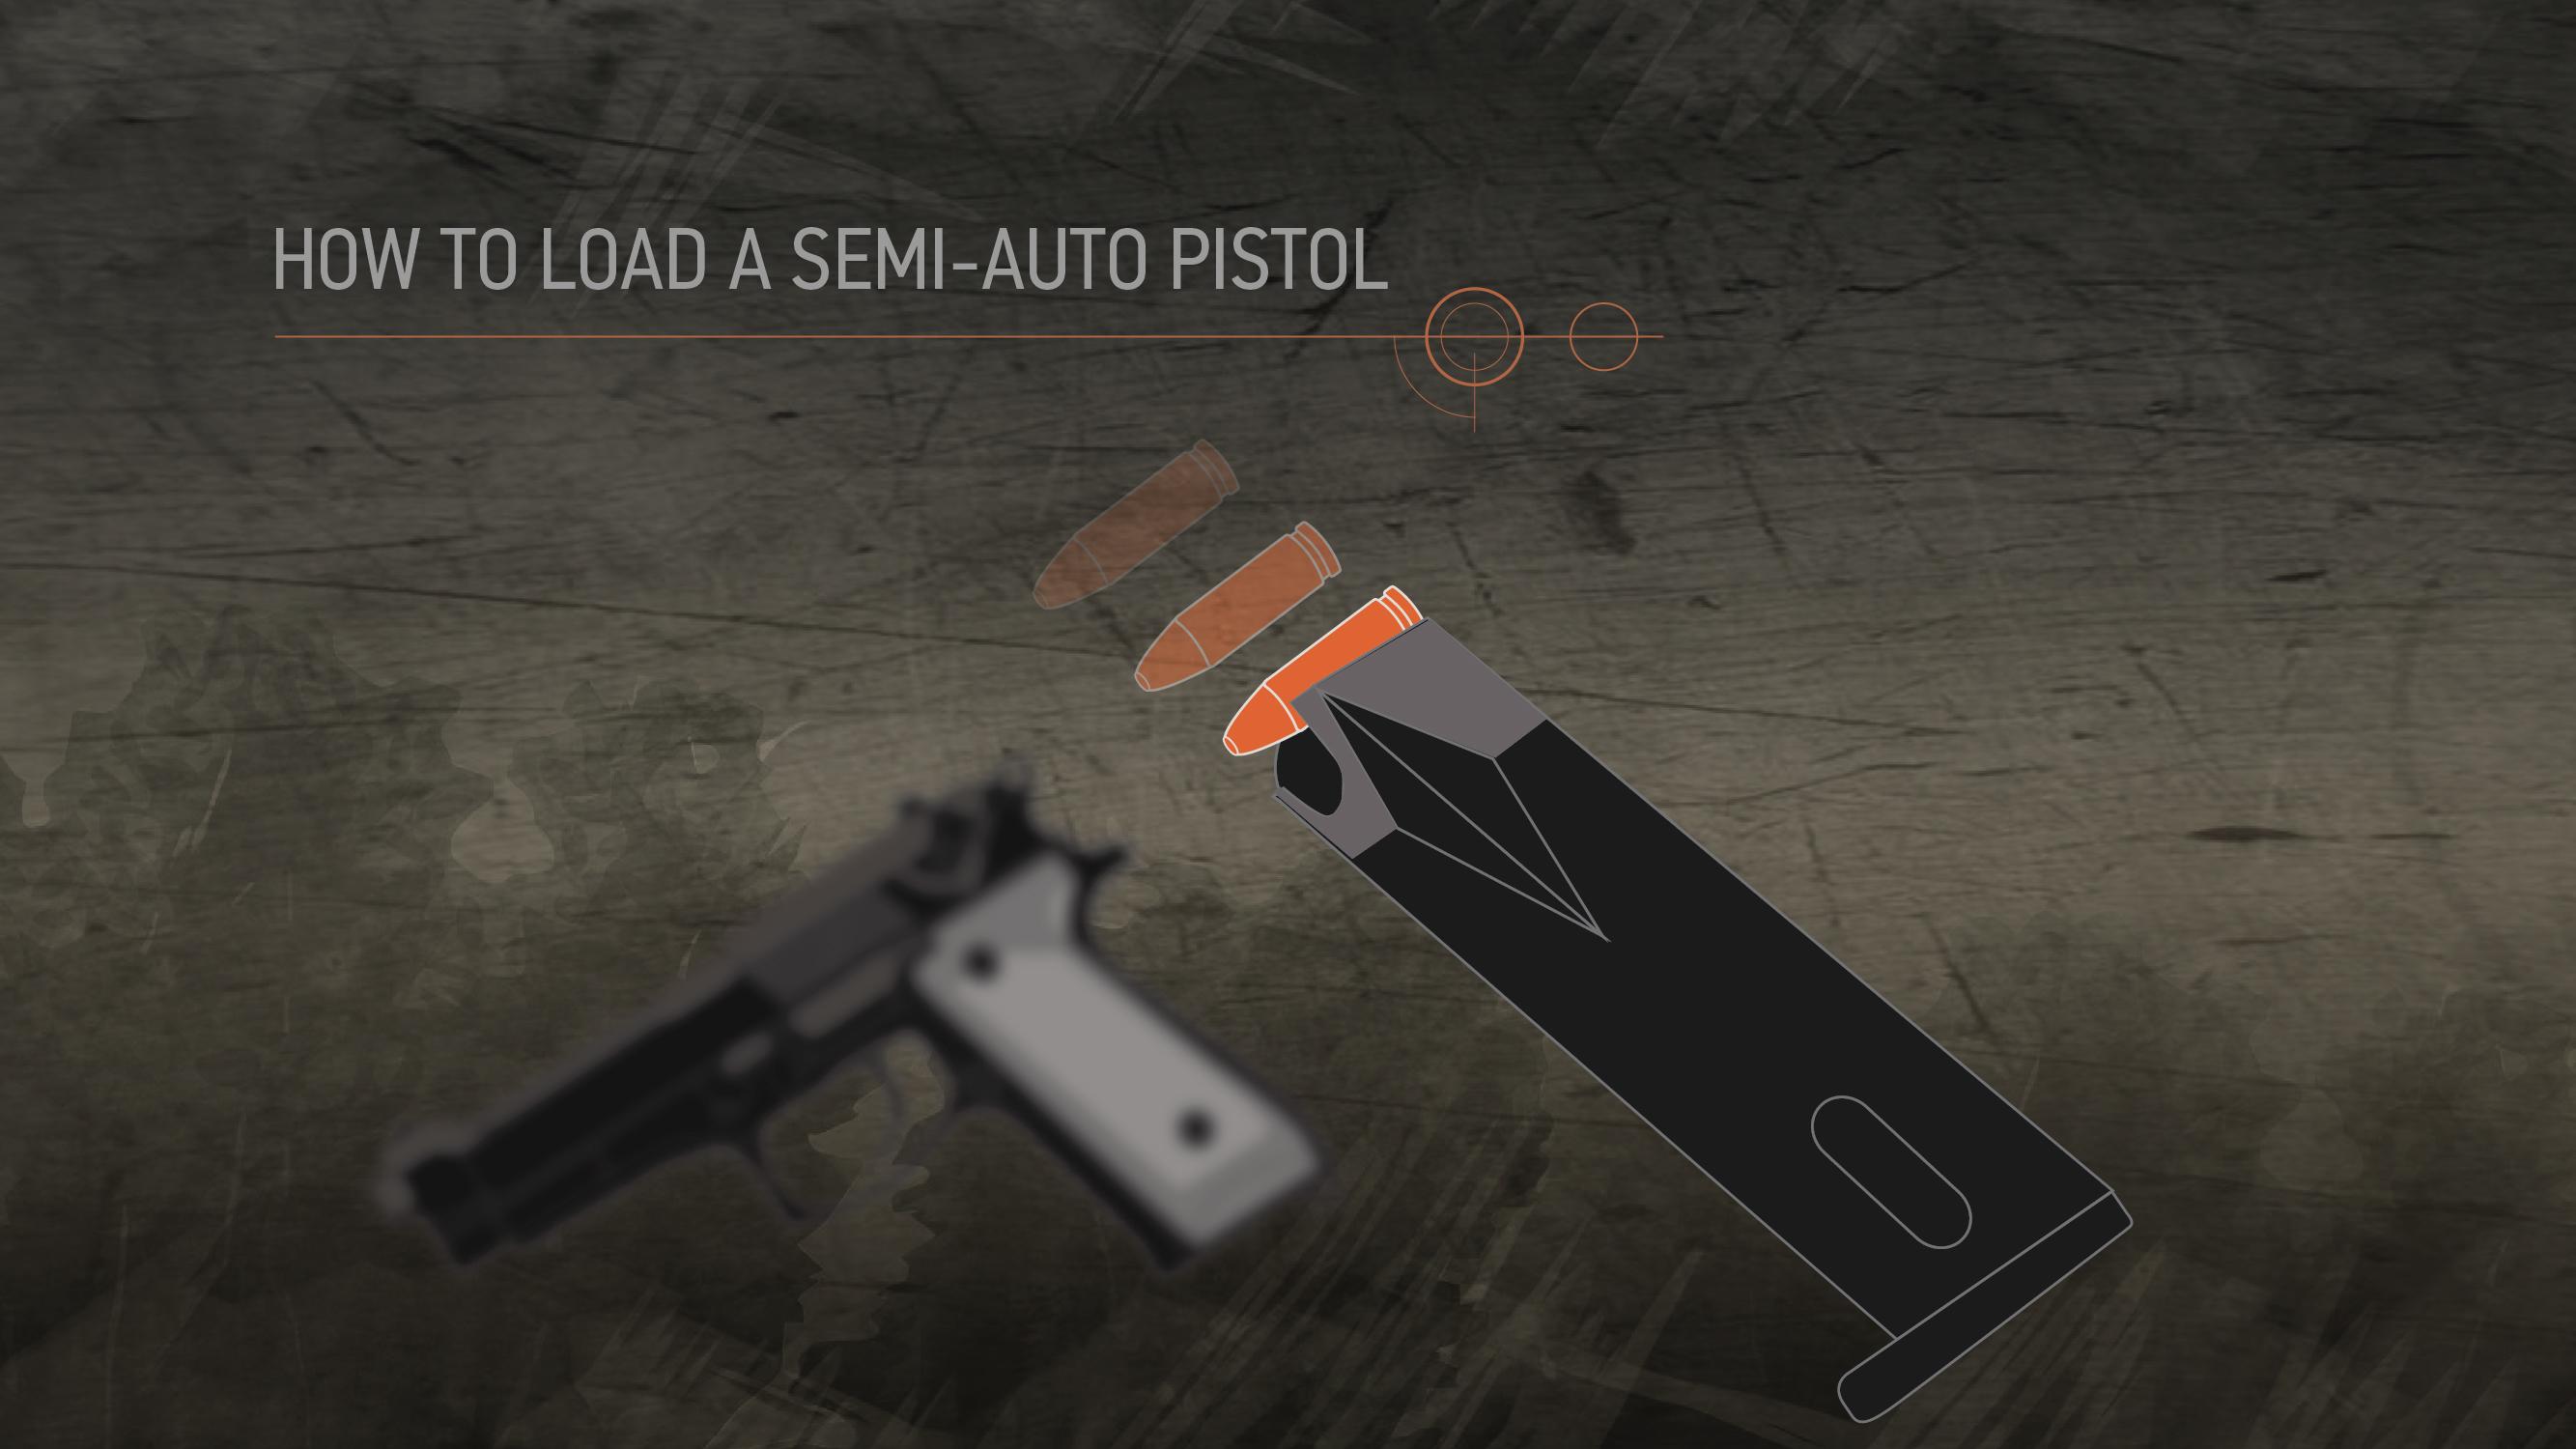 Illustration of ammunition being entered into a semi-auto pistol's magazine.